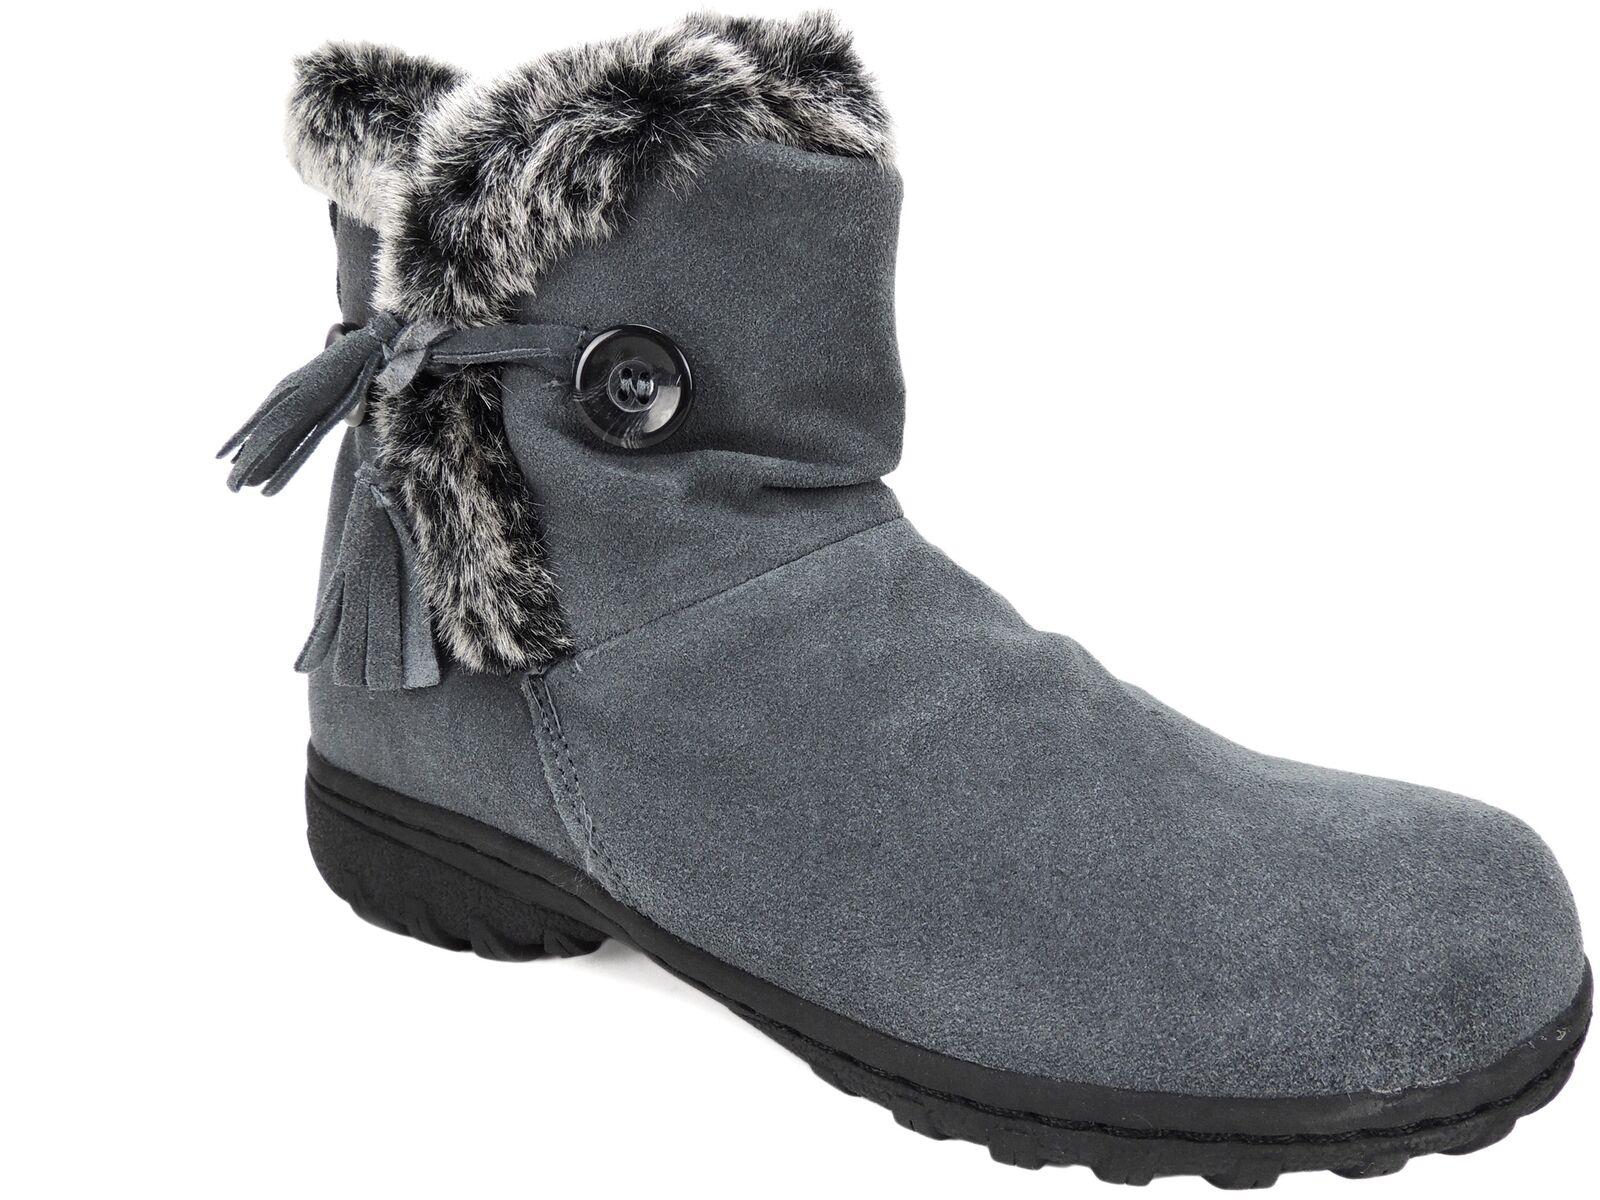 Khombu para mujer Botas de clima frío Isabella Gris Gris Gris Cuero M 428773